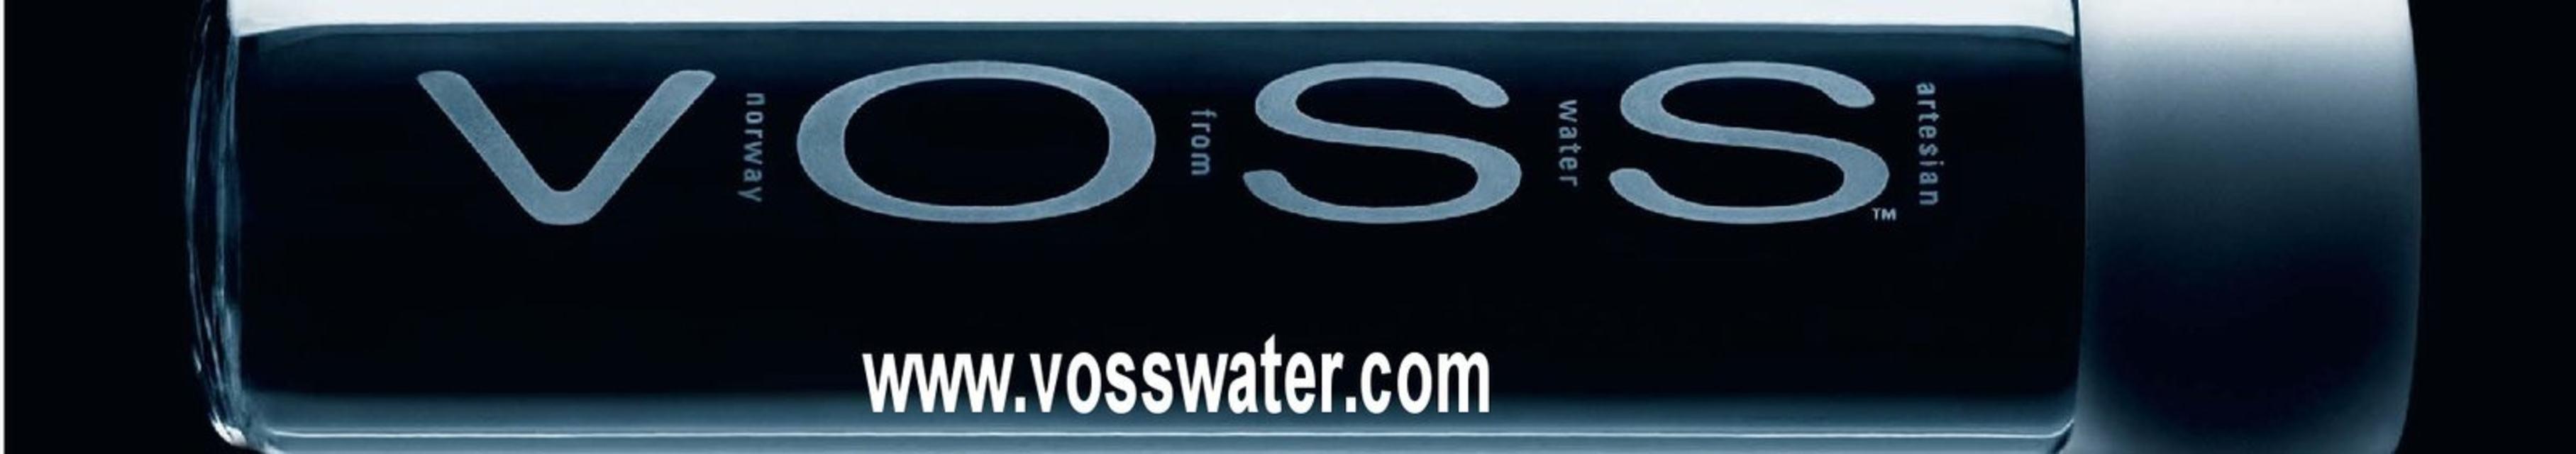 Det populære VOSS vannet produseres ved Vatnestrøm i Iveland kommune